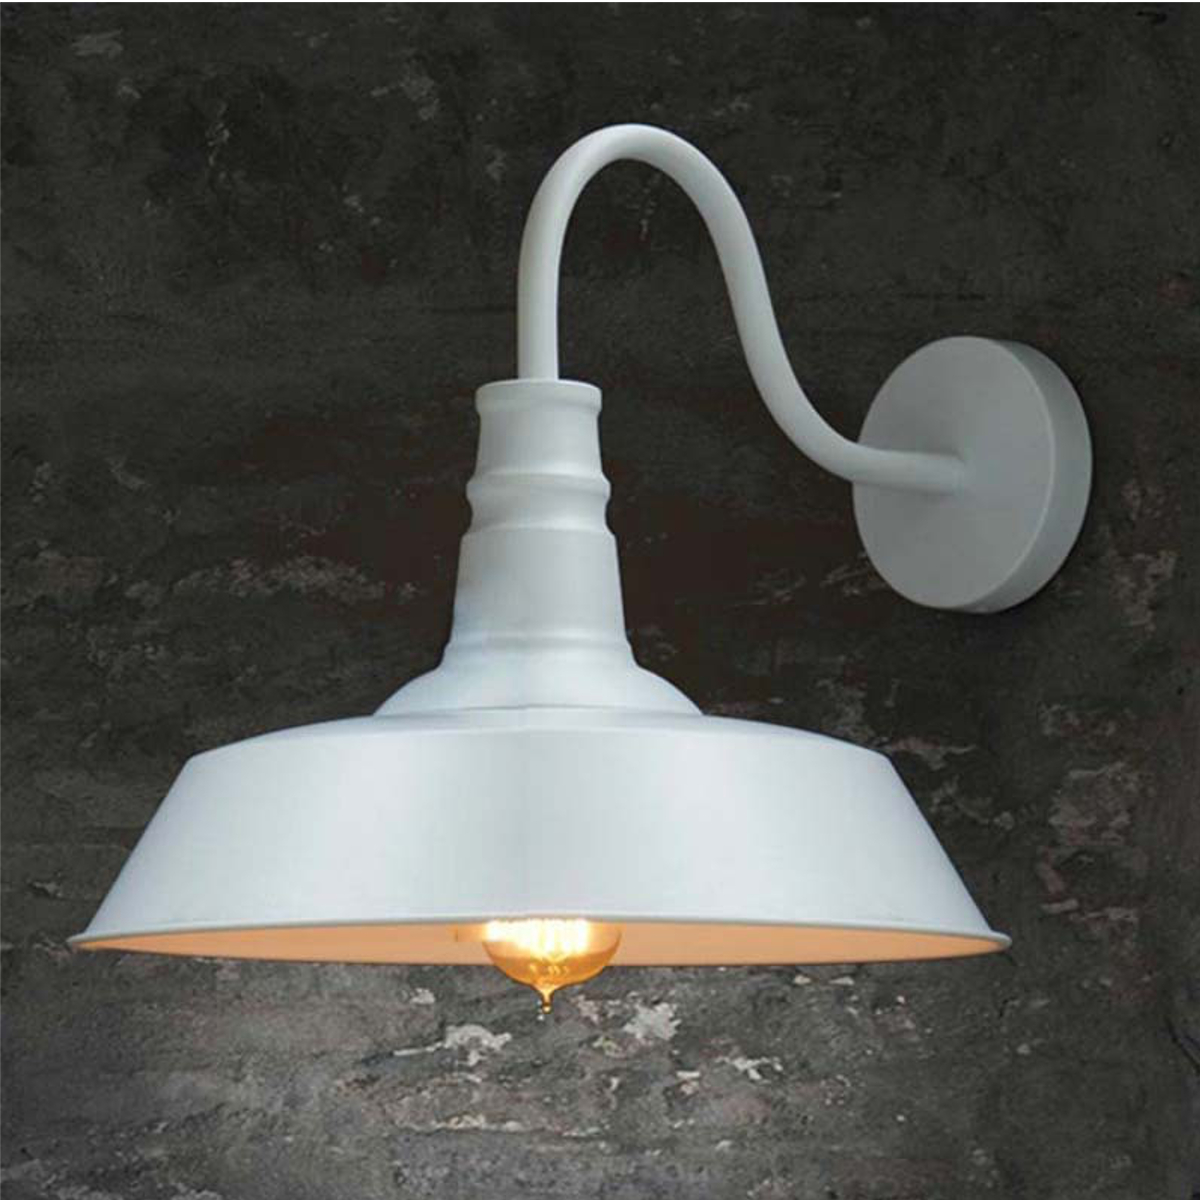 Vintage Wall Sconce Light Industrial, Antique White Bathroom Vanity Lights